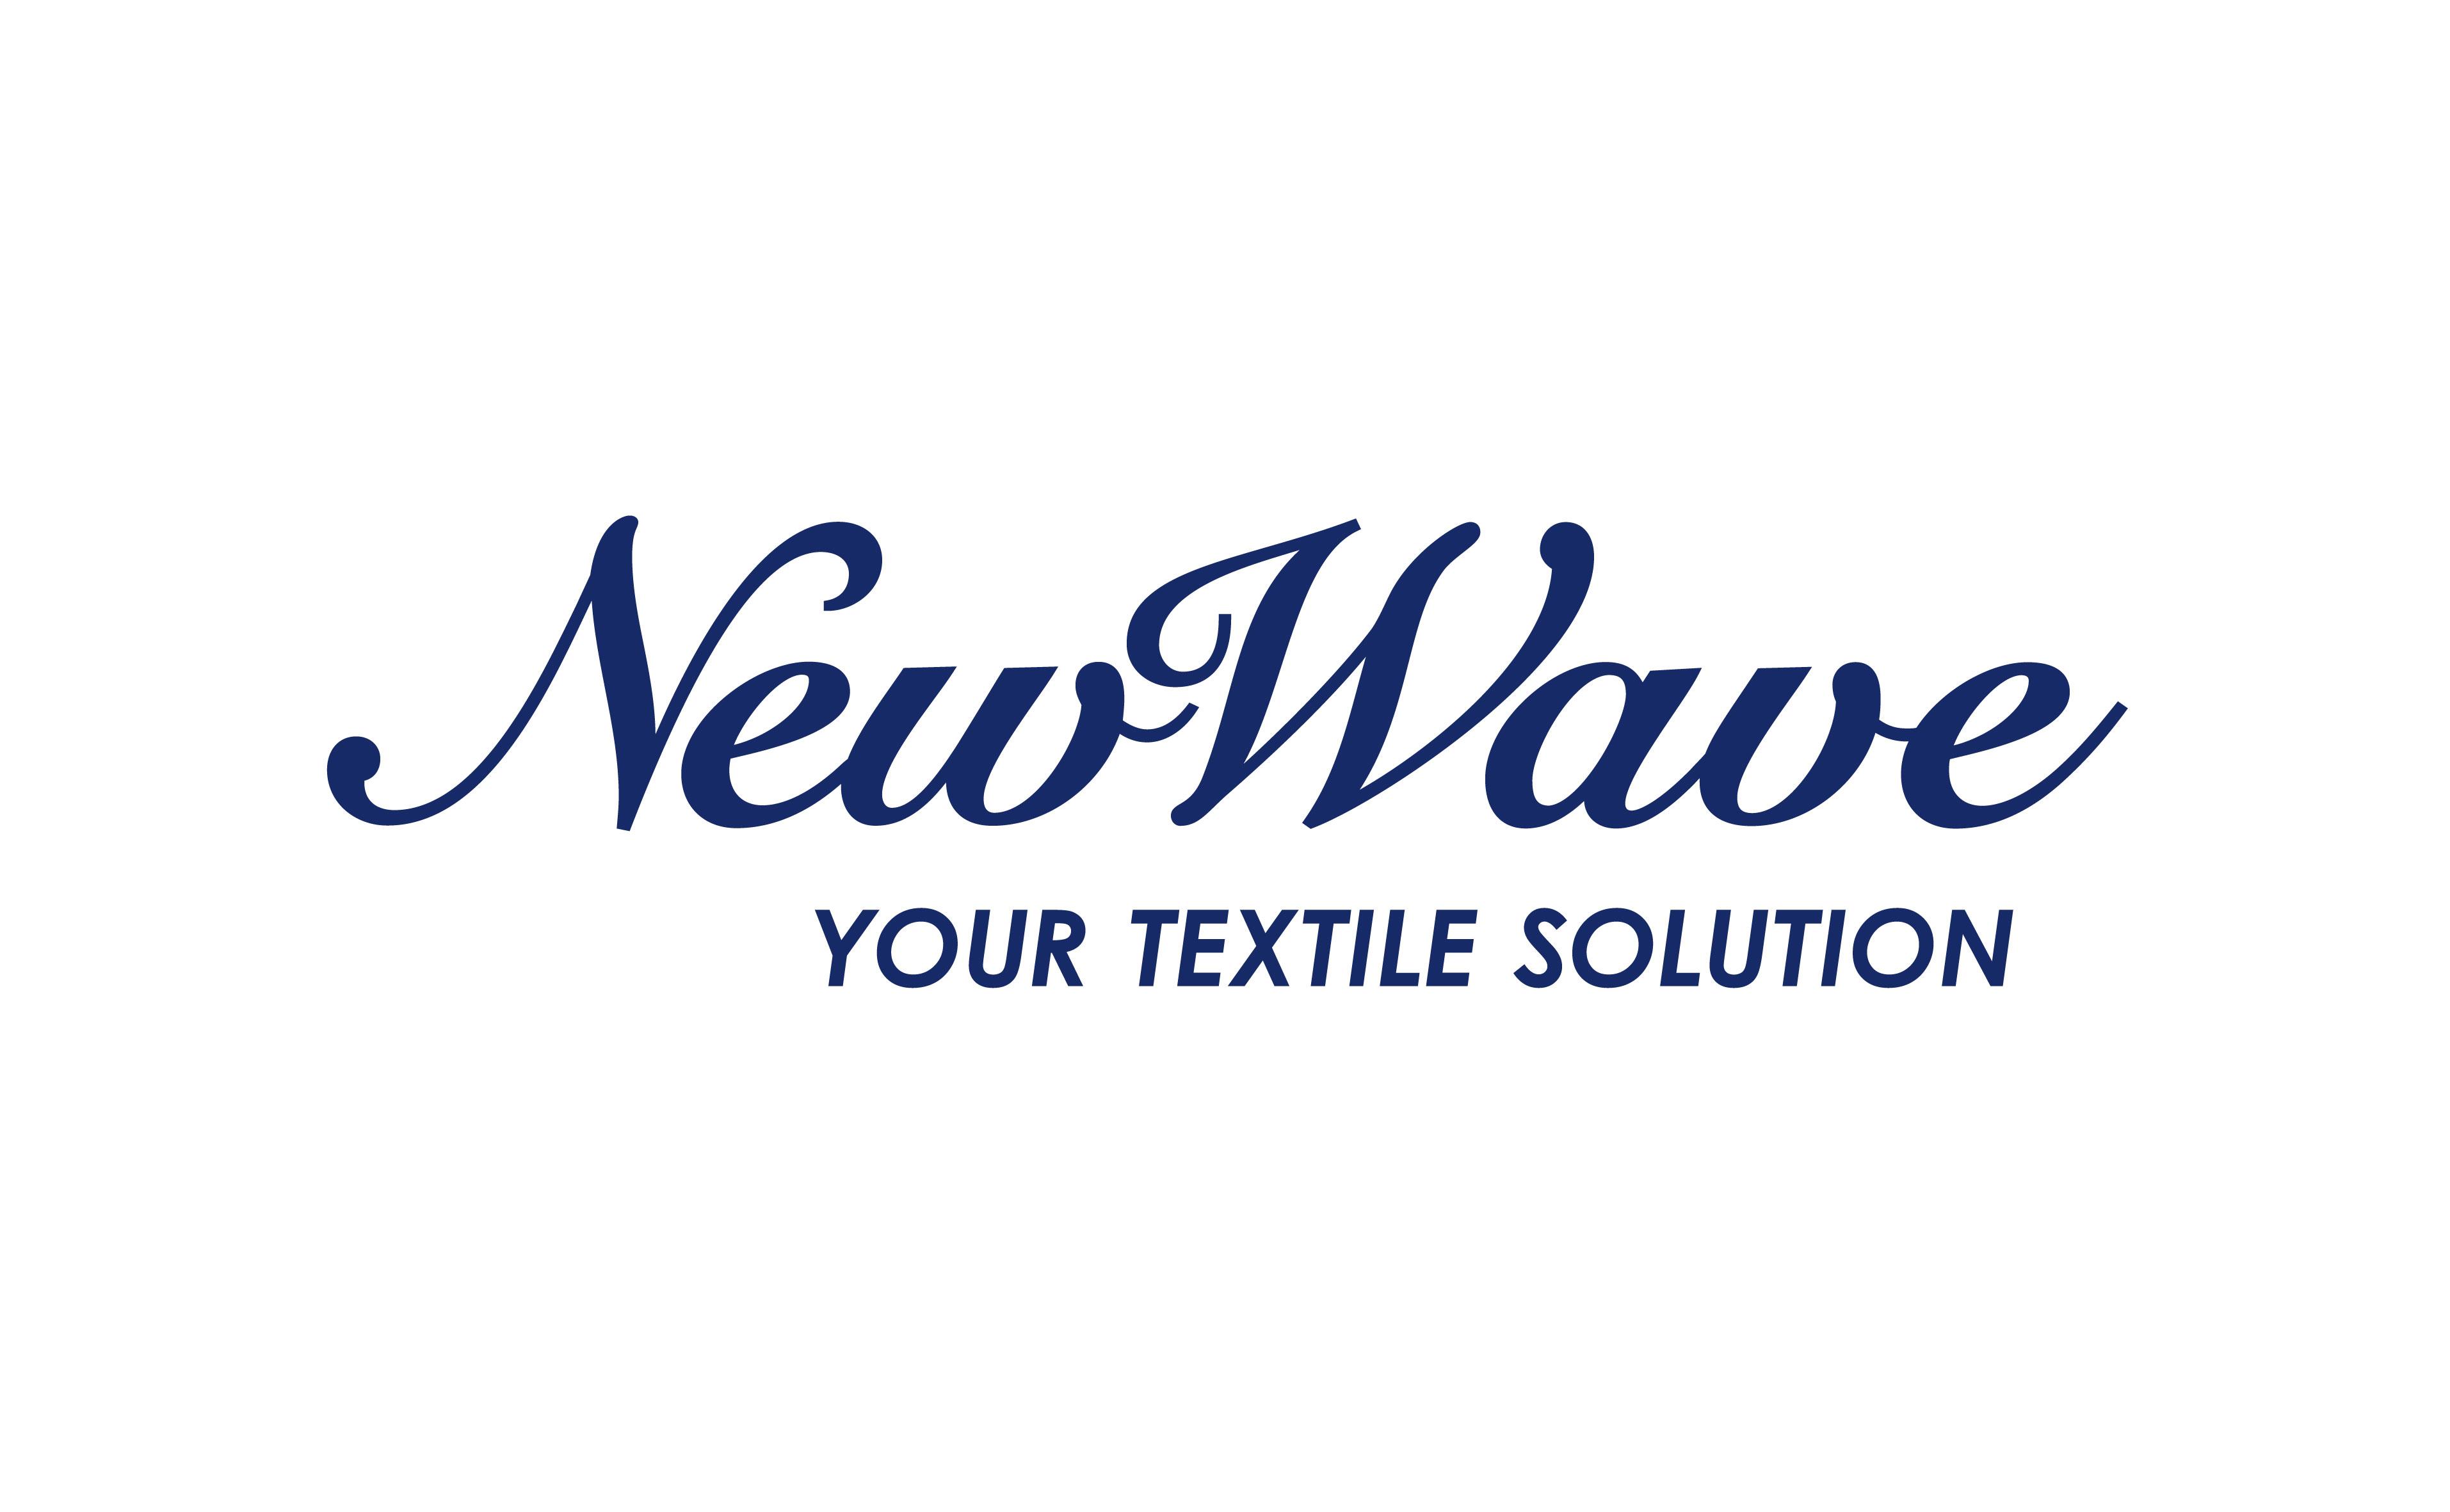 168 New Wave Group YTS 19 sans Pos 4c